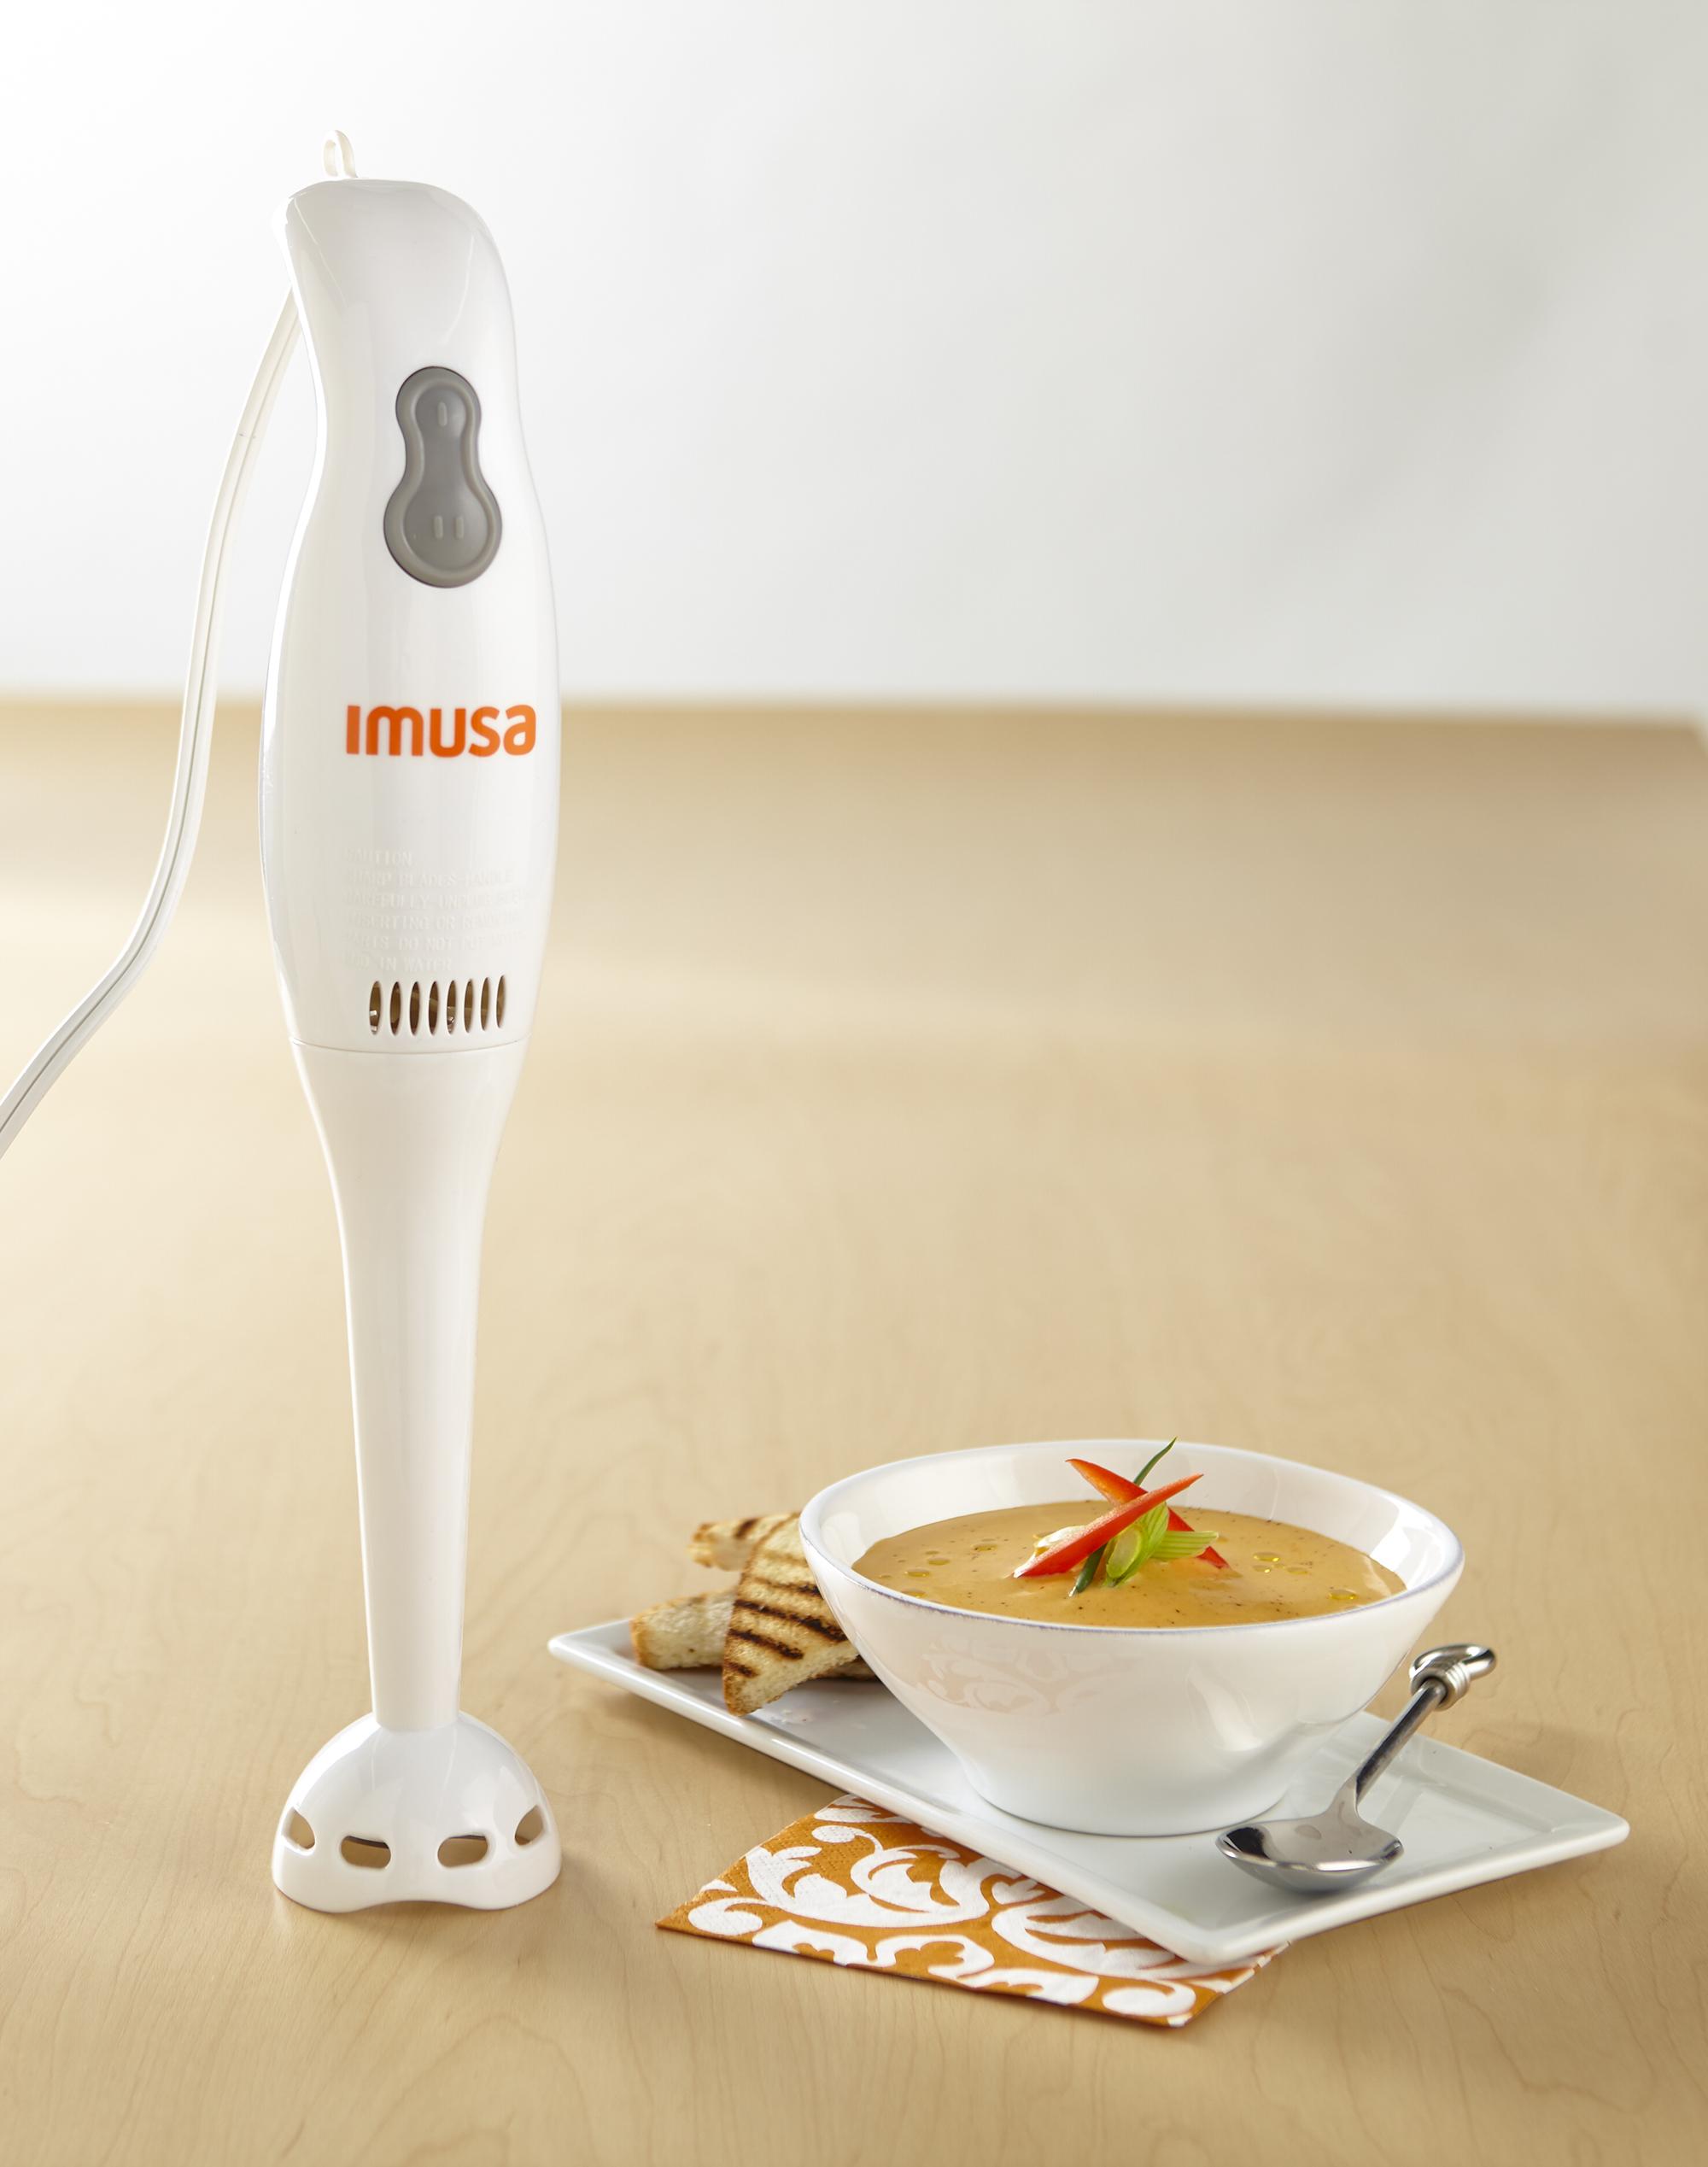 IMUSA Electric Hand Blender 2 Speed 200 Watts, White